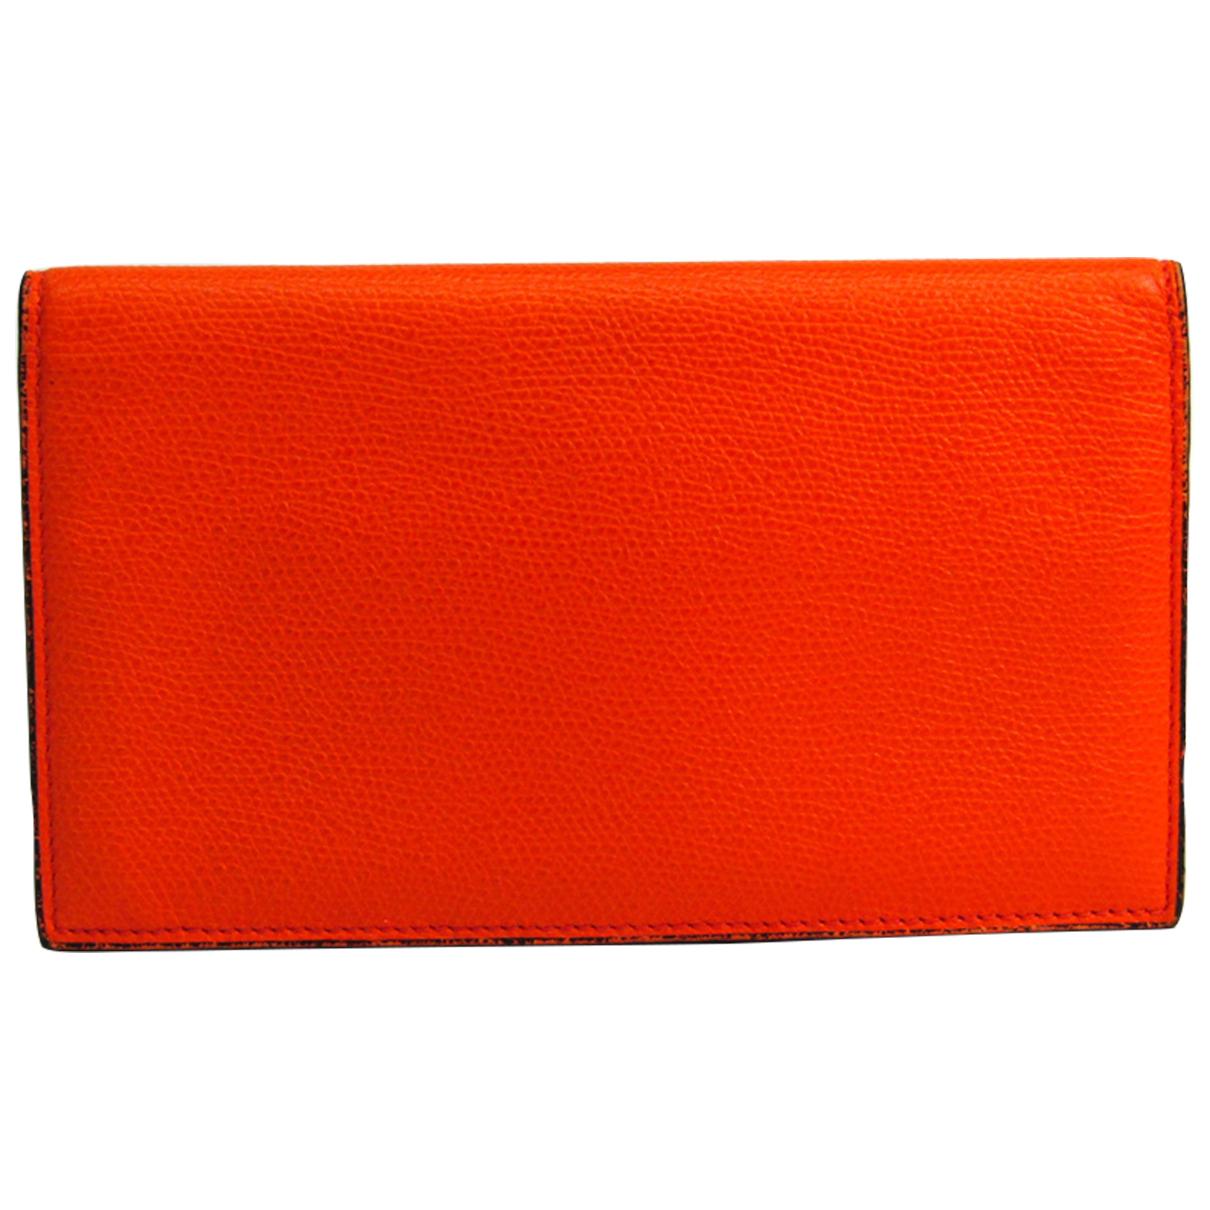 Valextra \N Portemonnaie in  Orange Leder